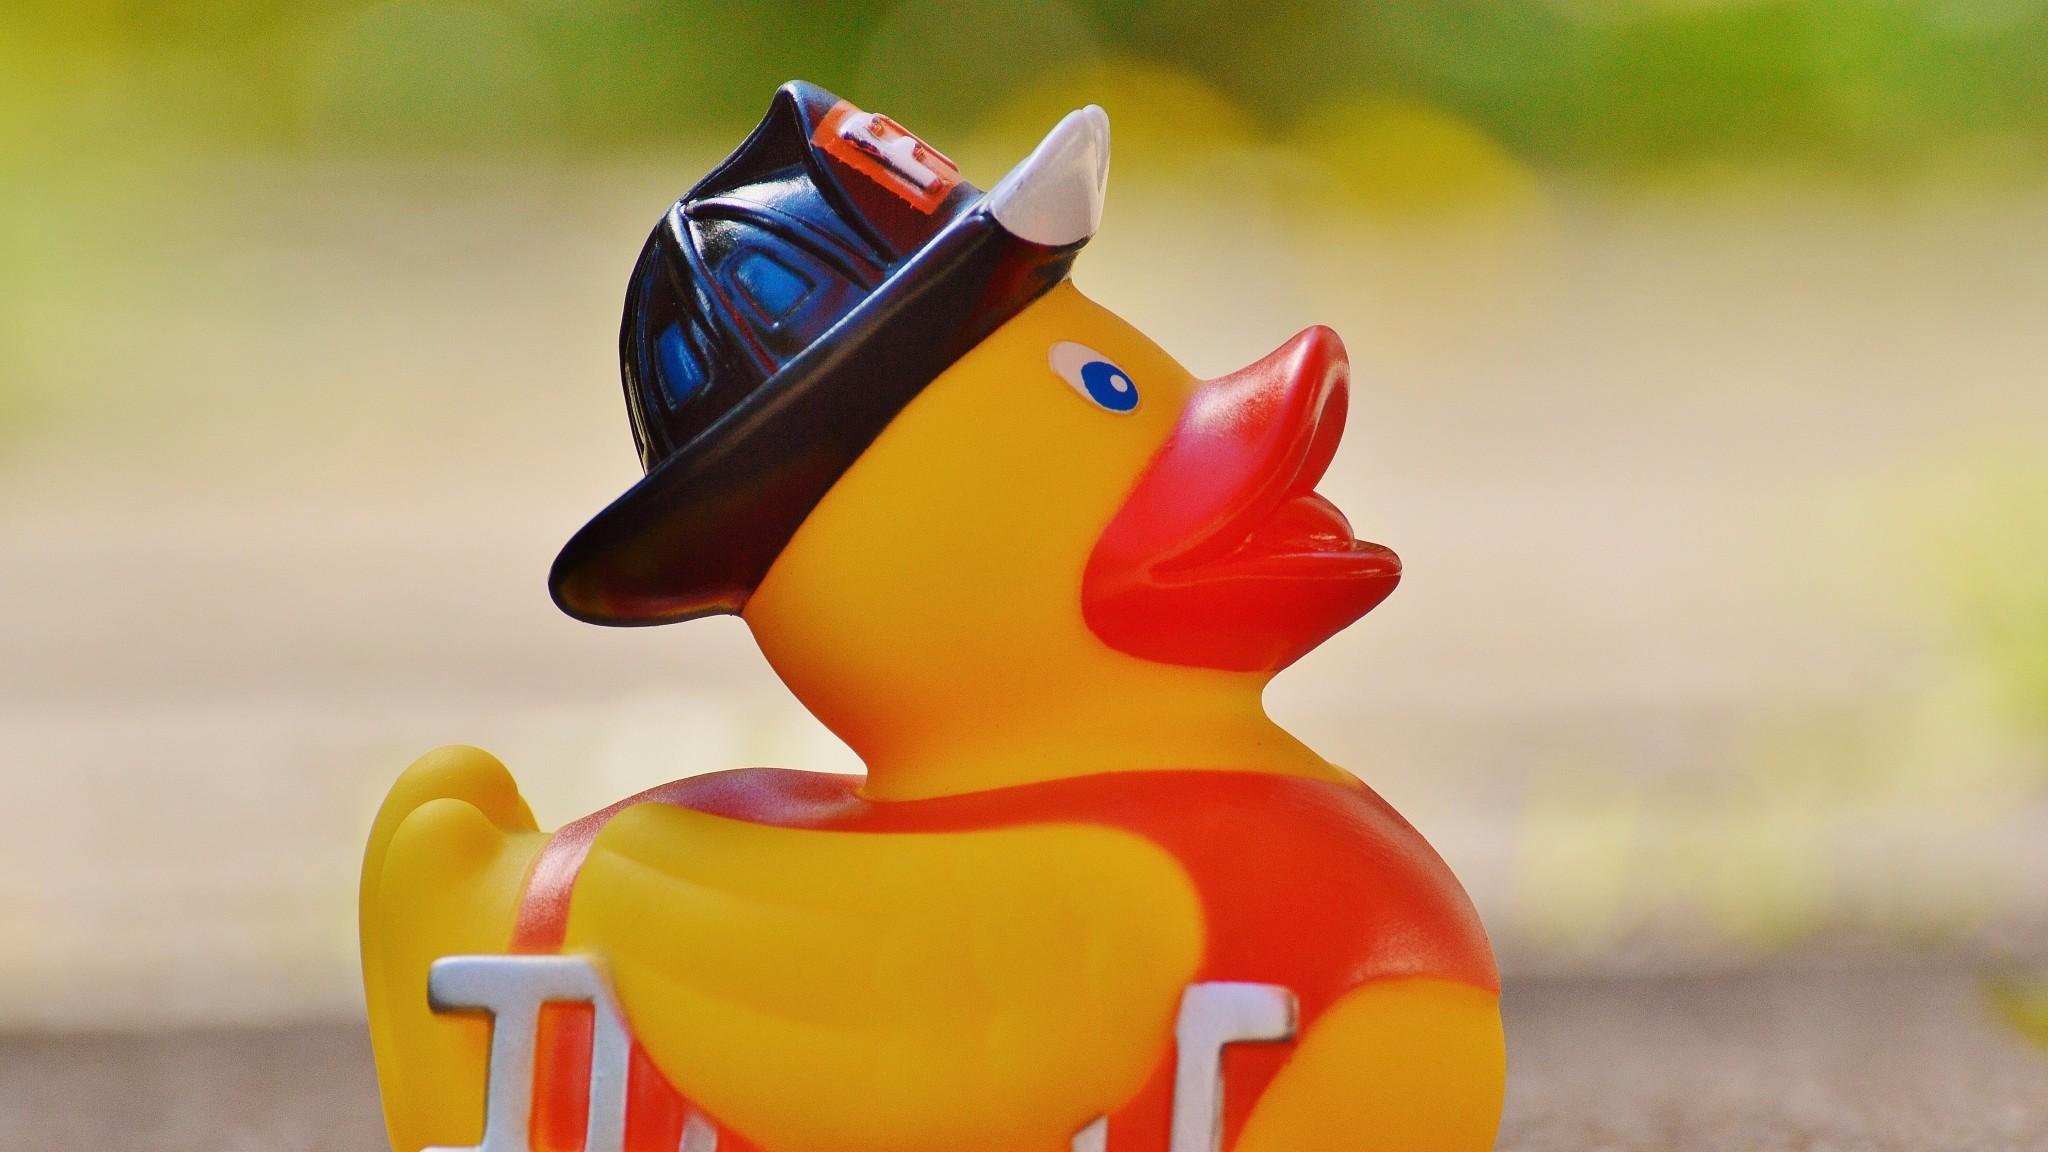 Rubber Ducky Wallpaper 183 ① Wallpapertag